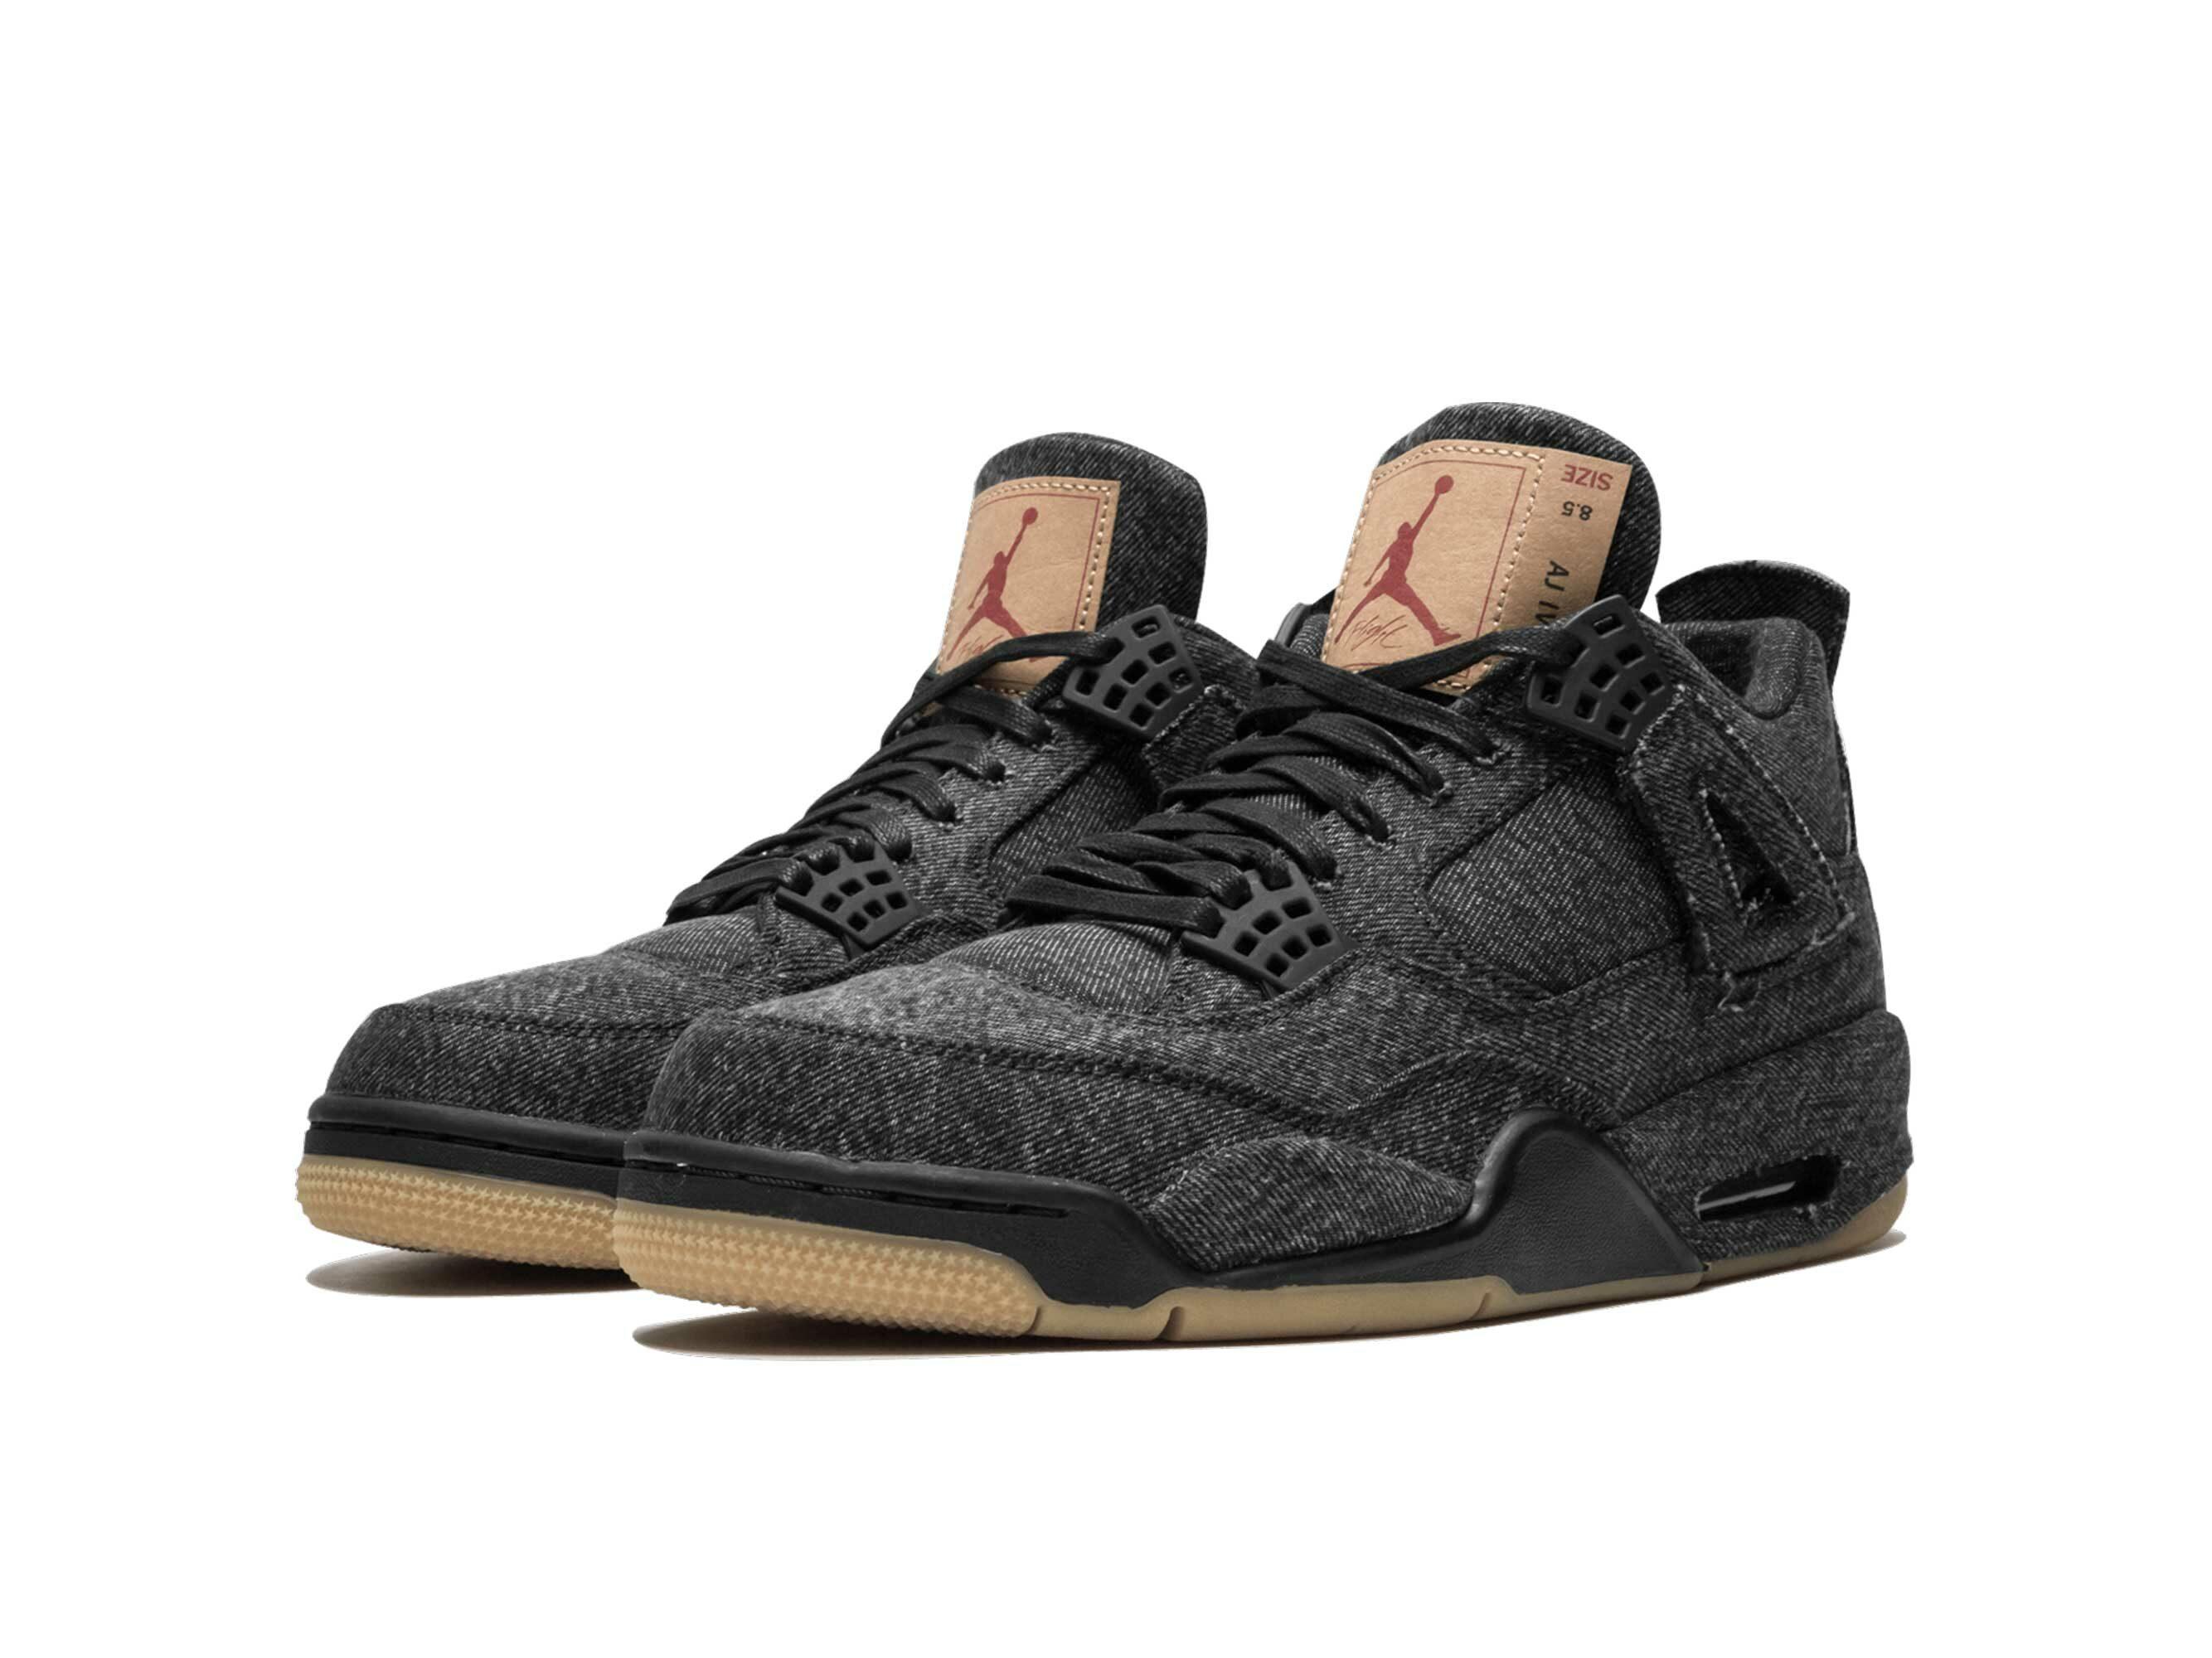 nike air Jordan 4 retro black levis NRG AO2571_001 купить